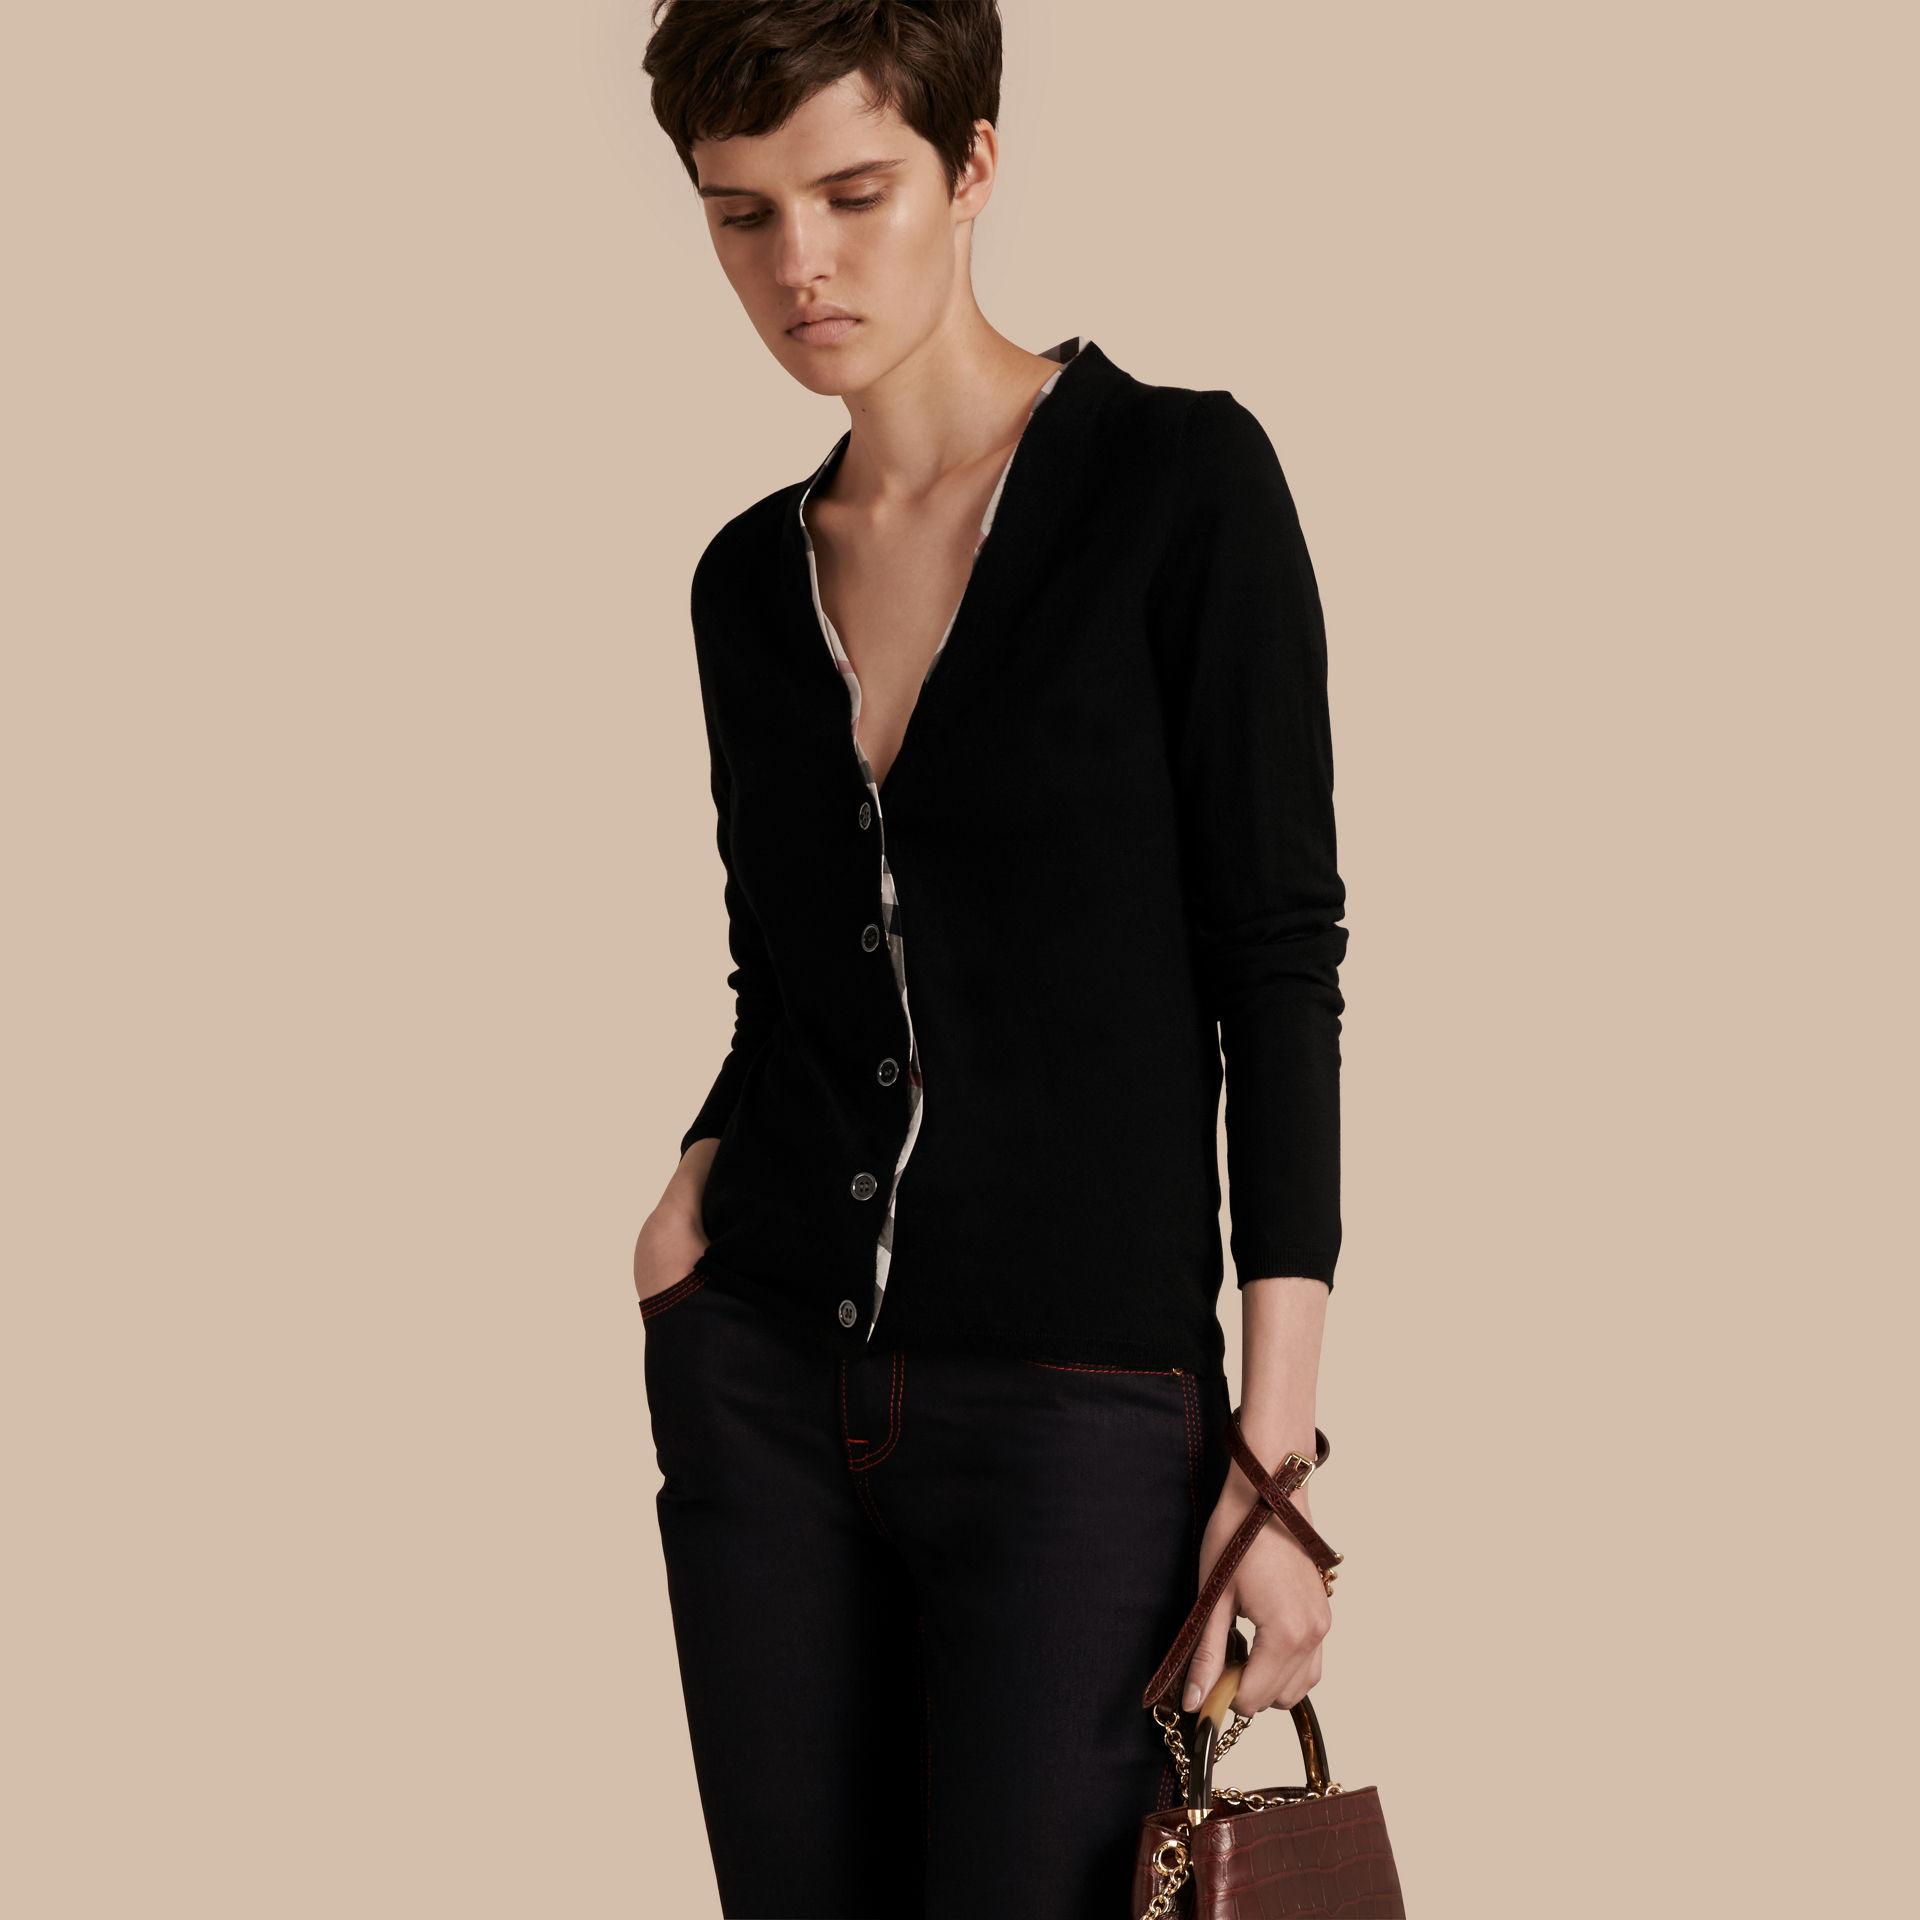 906996141352b Lyst - Burberry Check Placket Wool Cardigan in Black